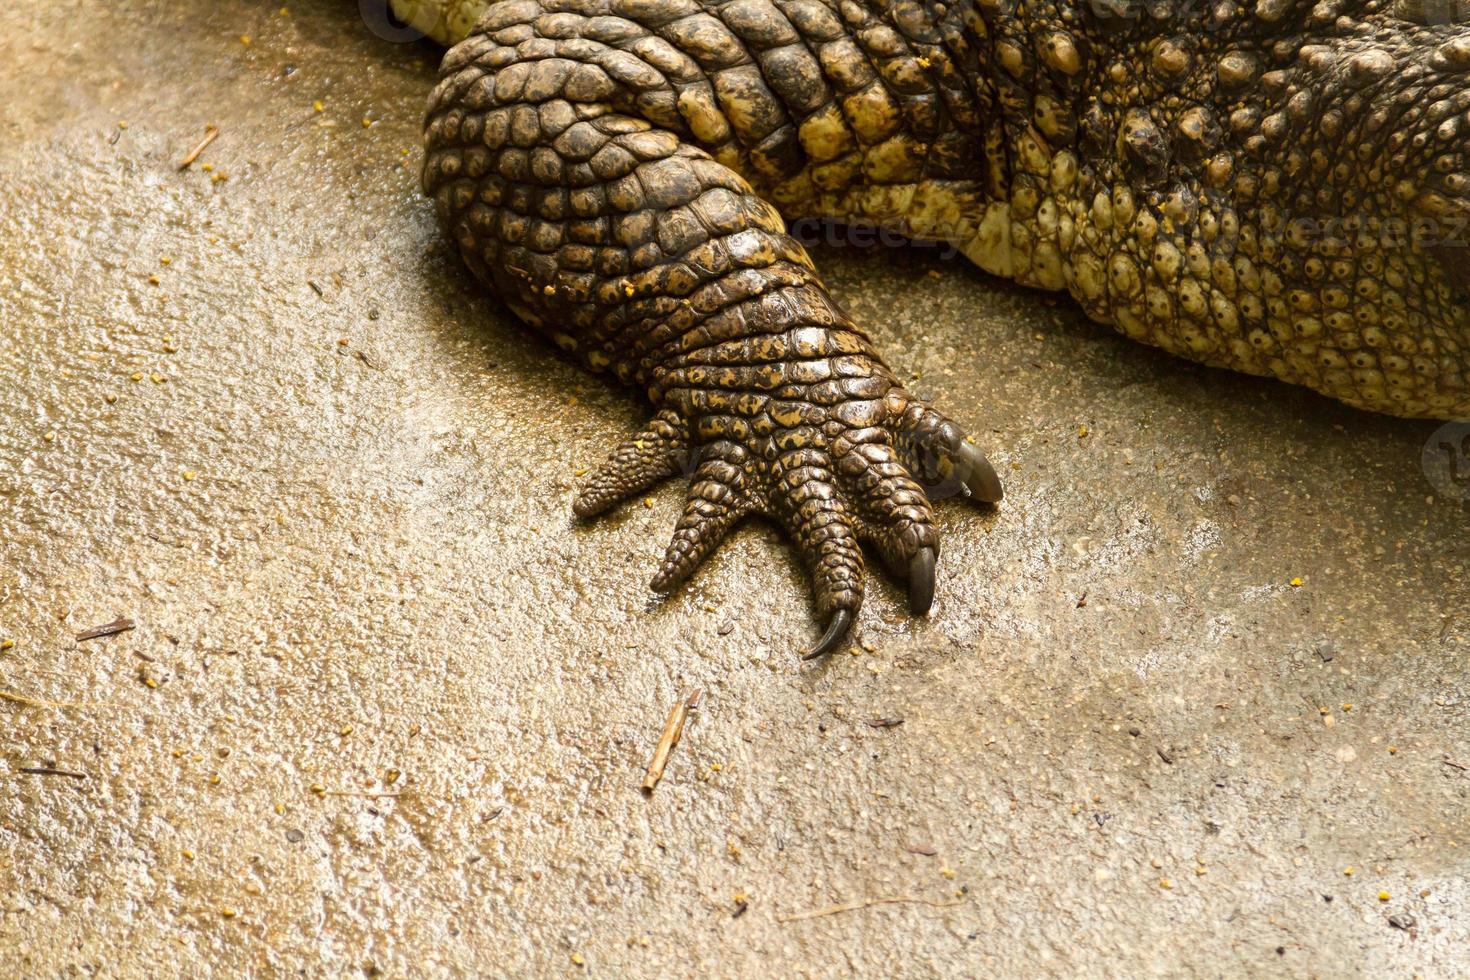 voet krokodil foto